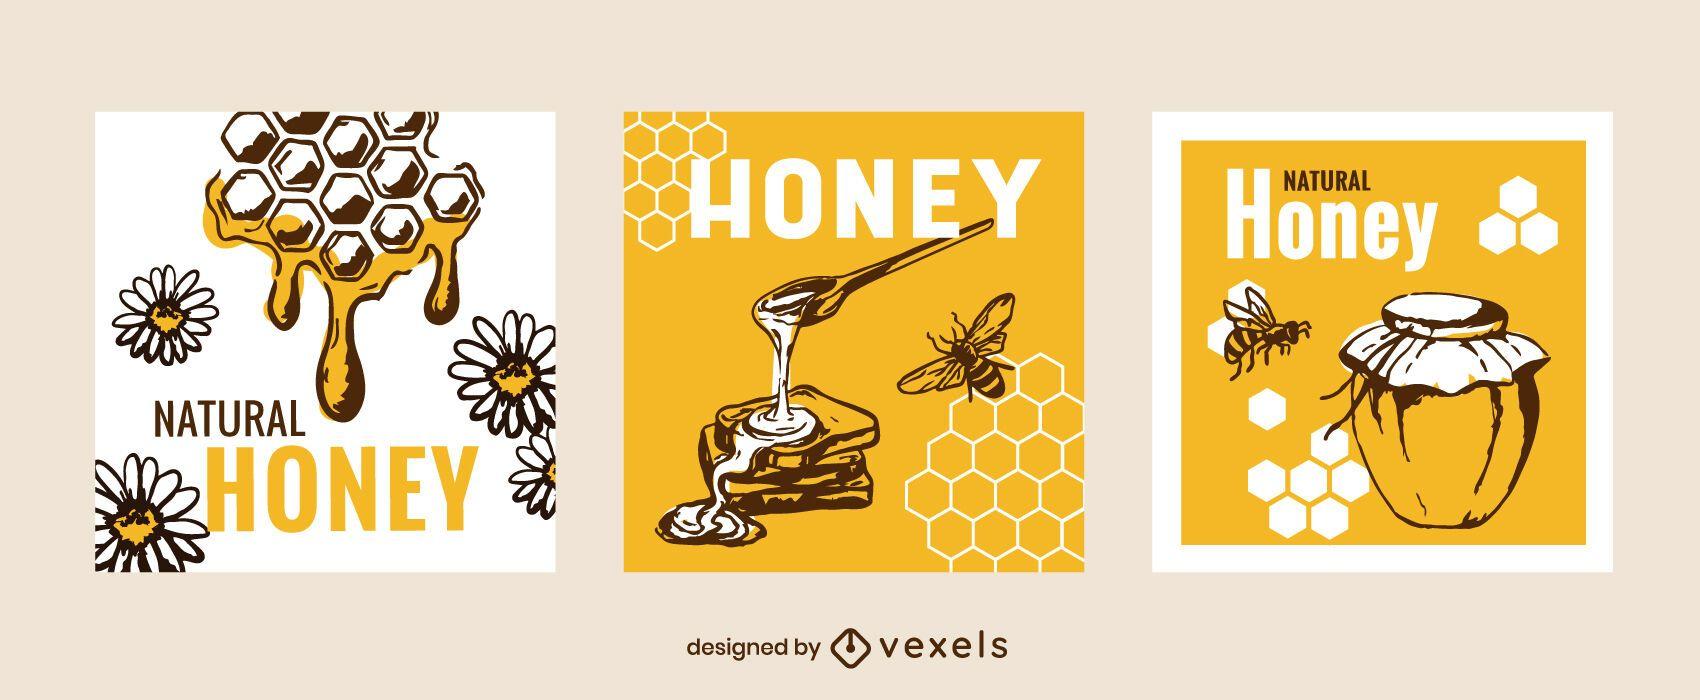 Natural honey square banner set